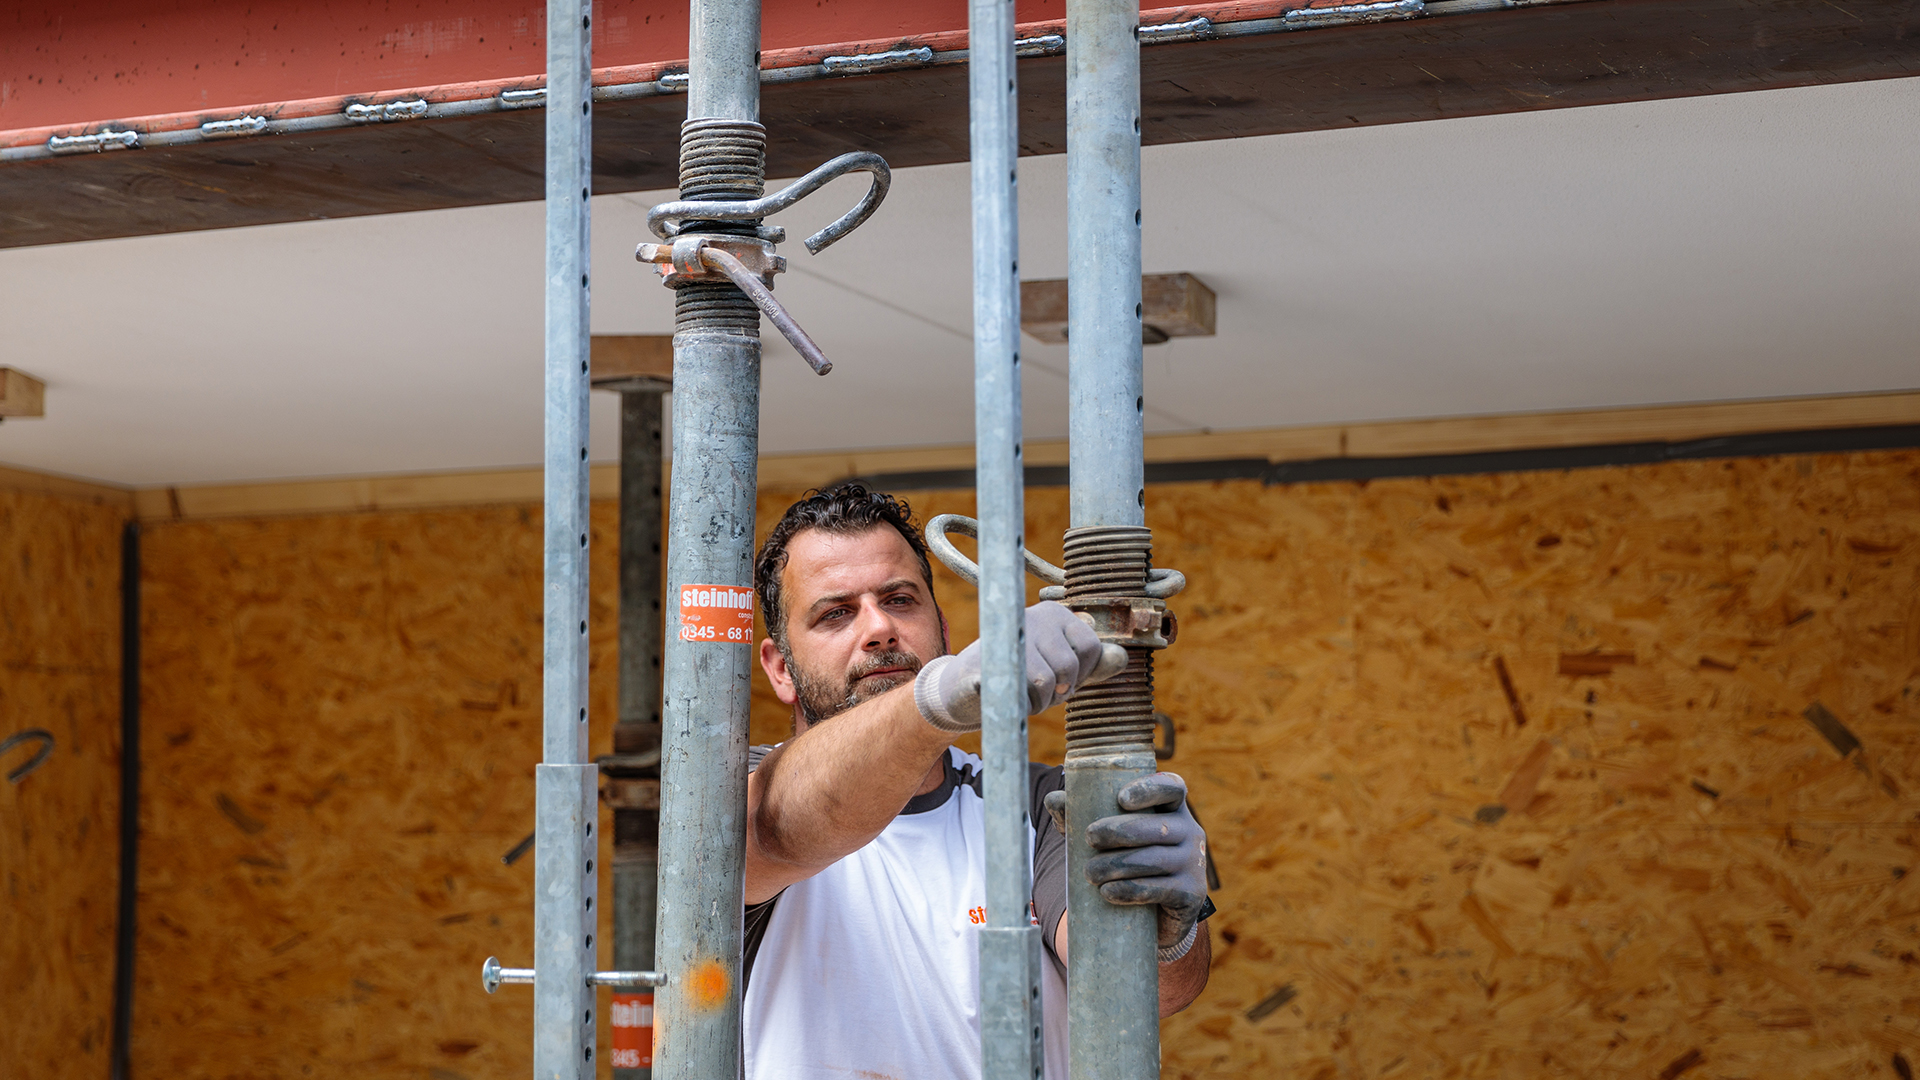 Steinhoff -  Buitenmuur verwijderen - In praktijk